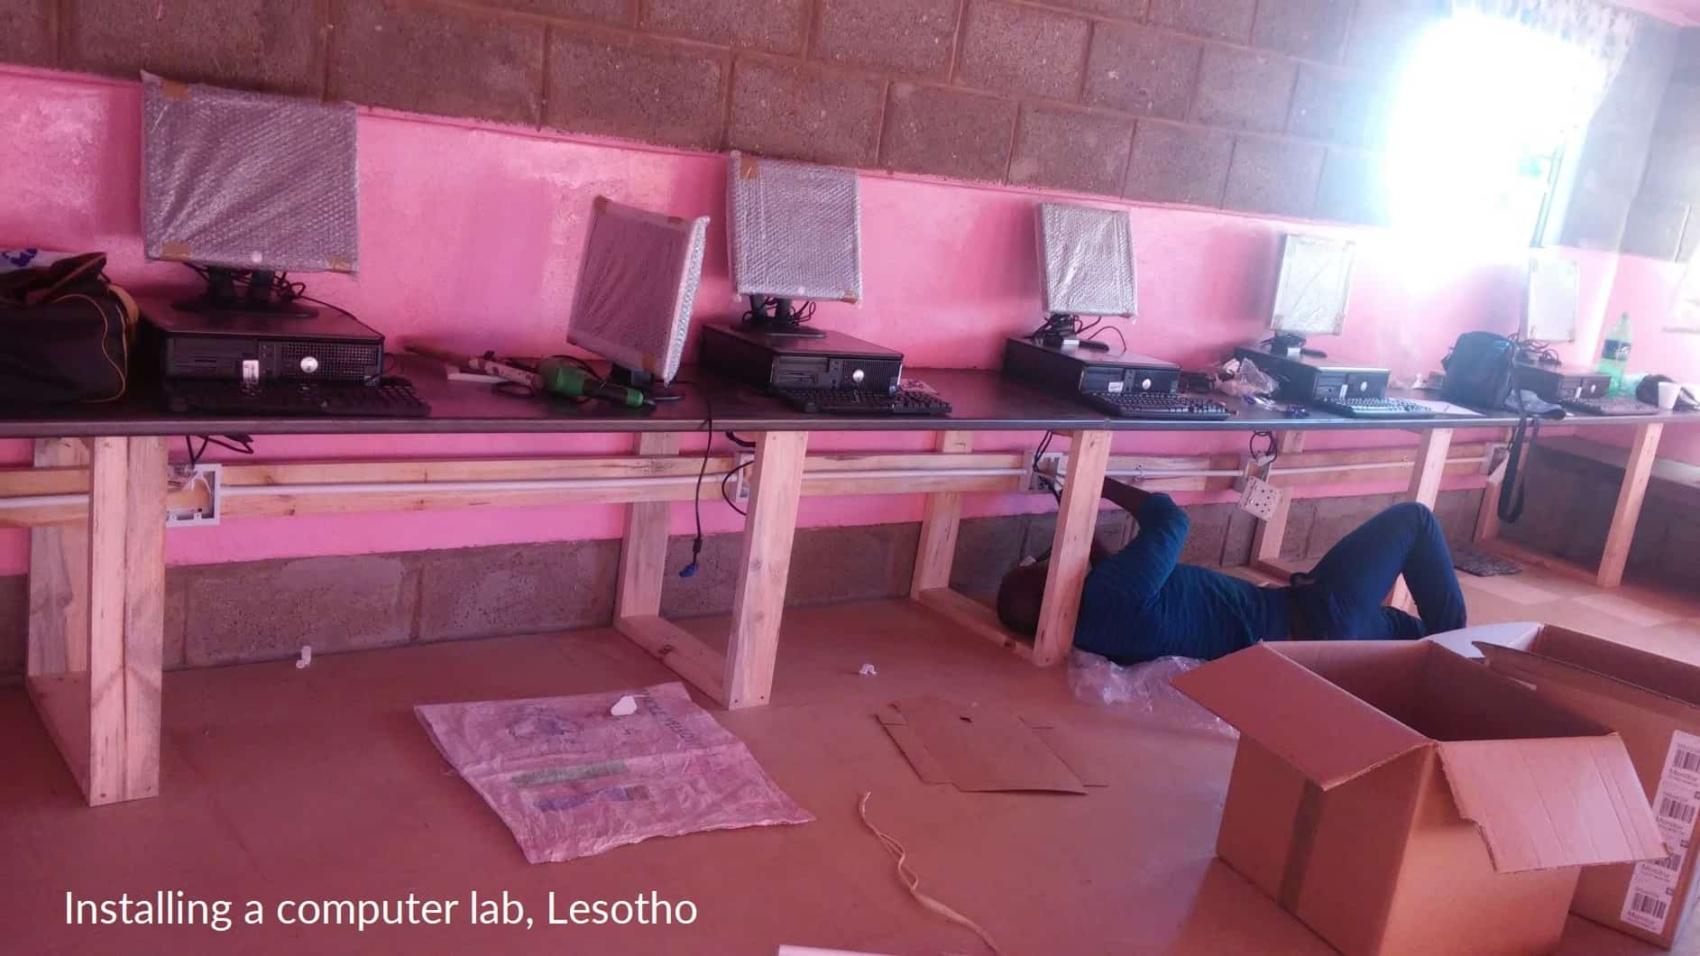 Lan construction, Lesotho, captioned